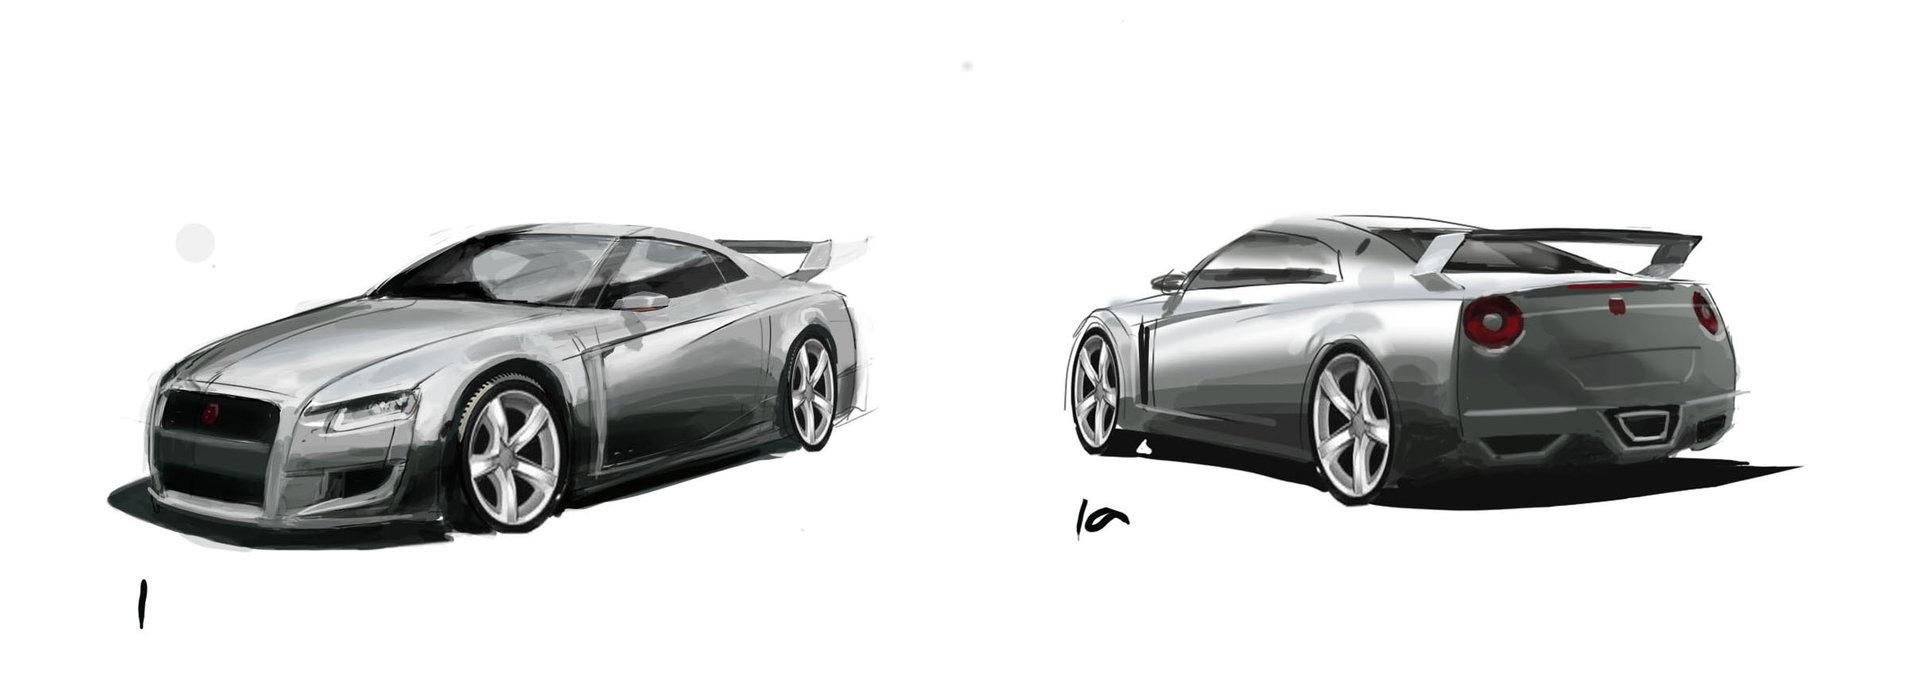 Skyline sketches 2